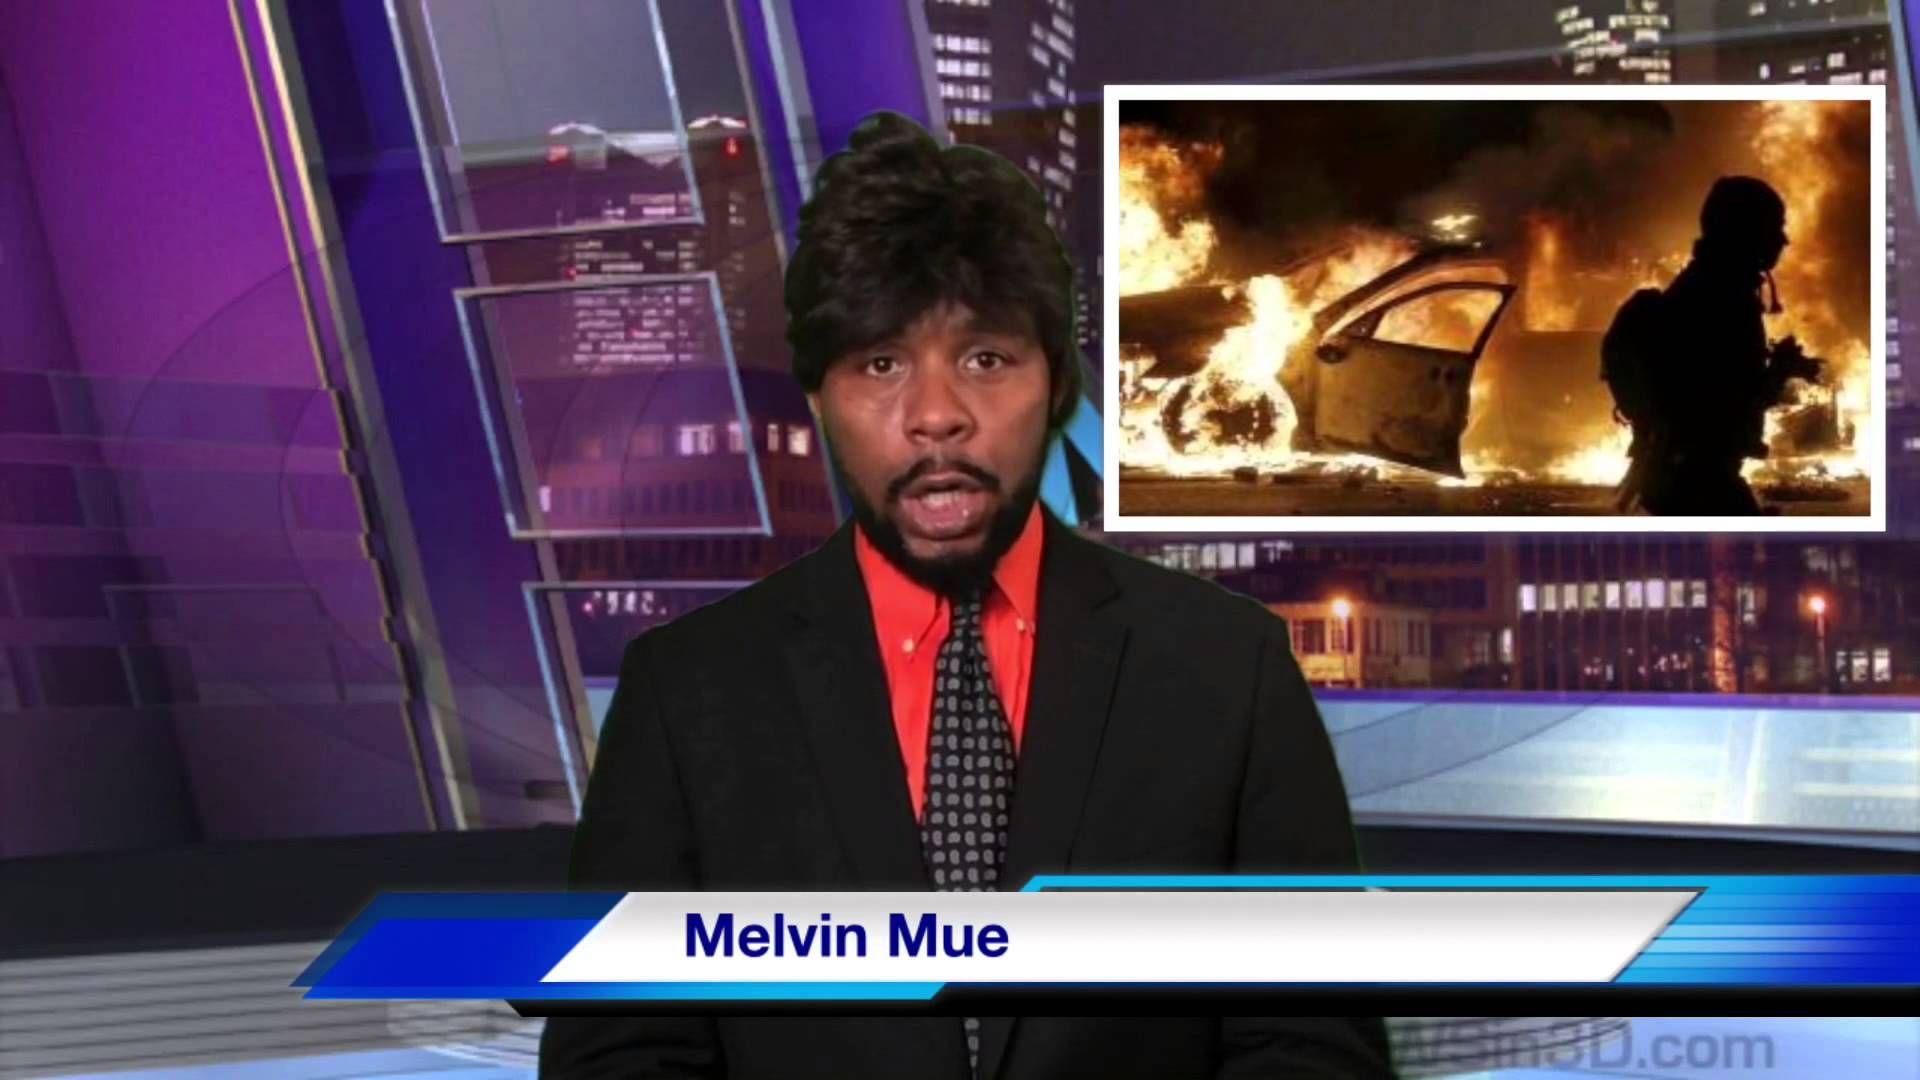 Studio News with Melvin Mue (ferguson riots)